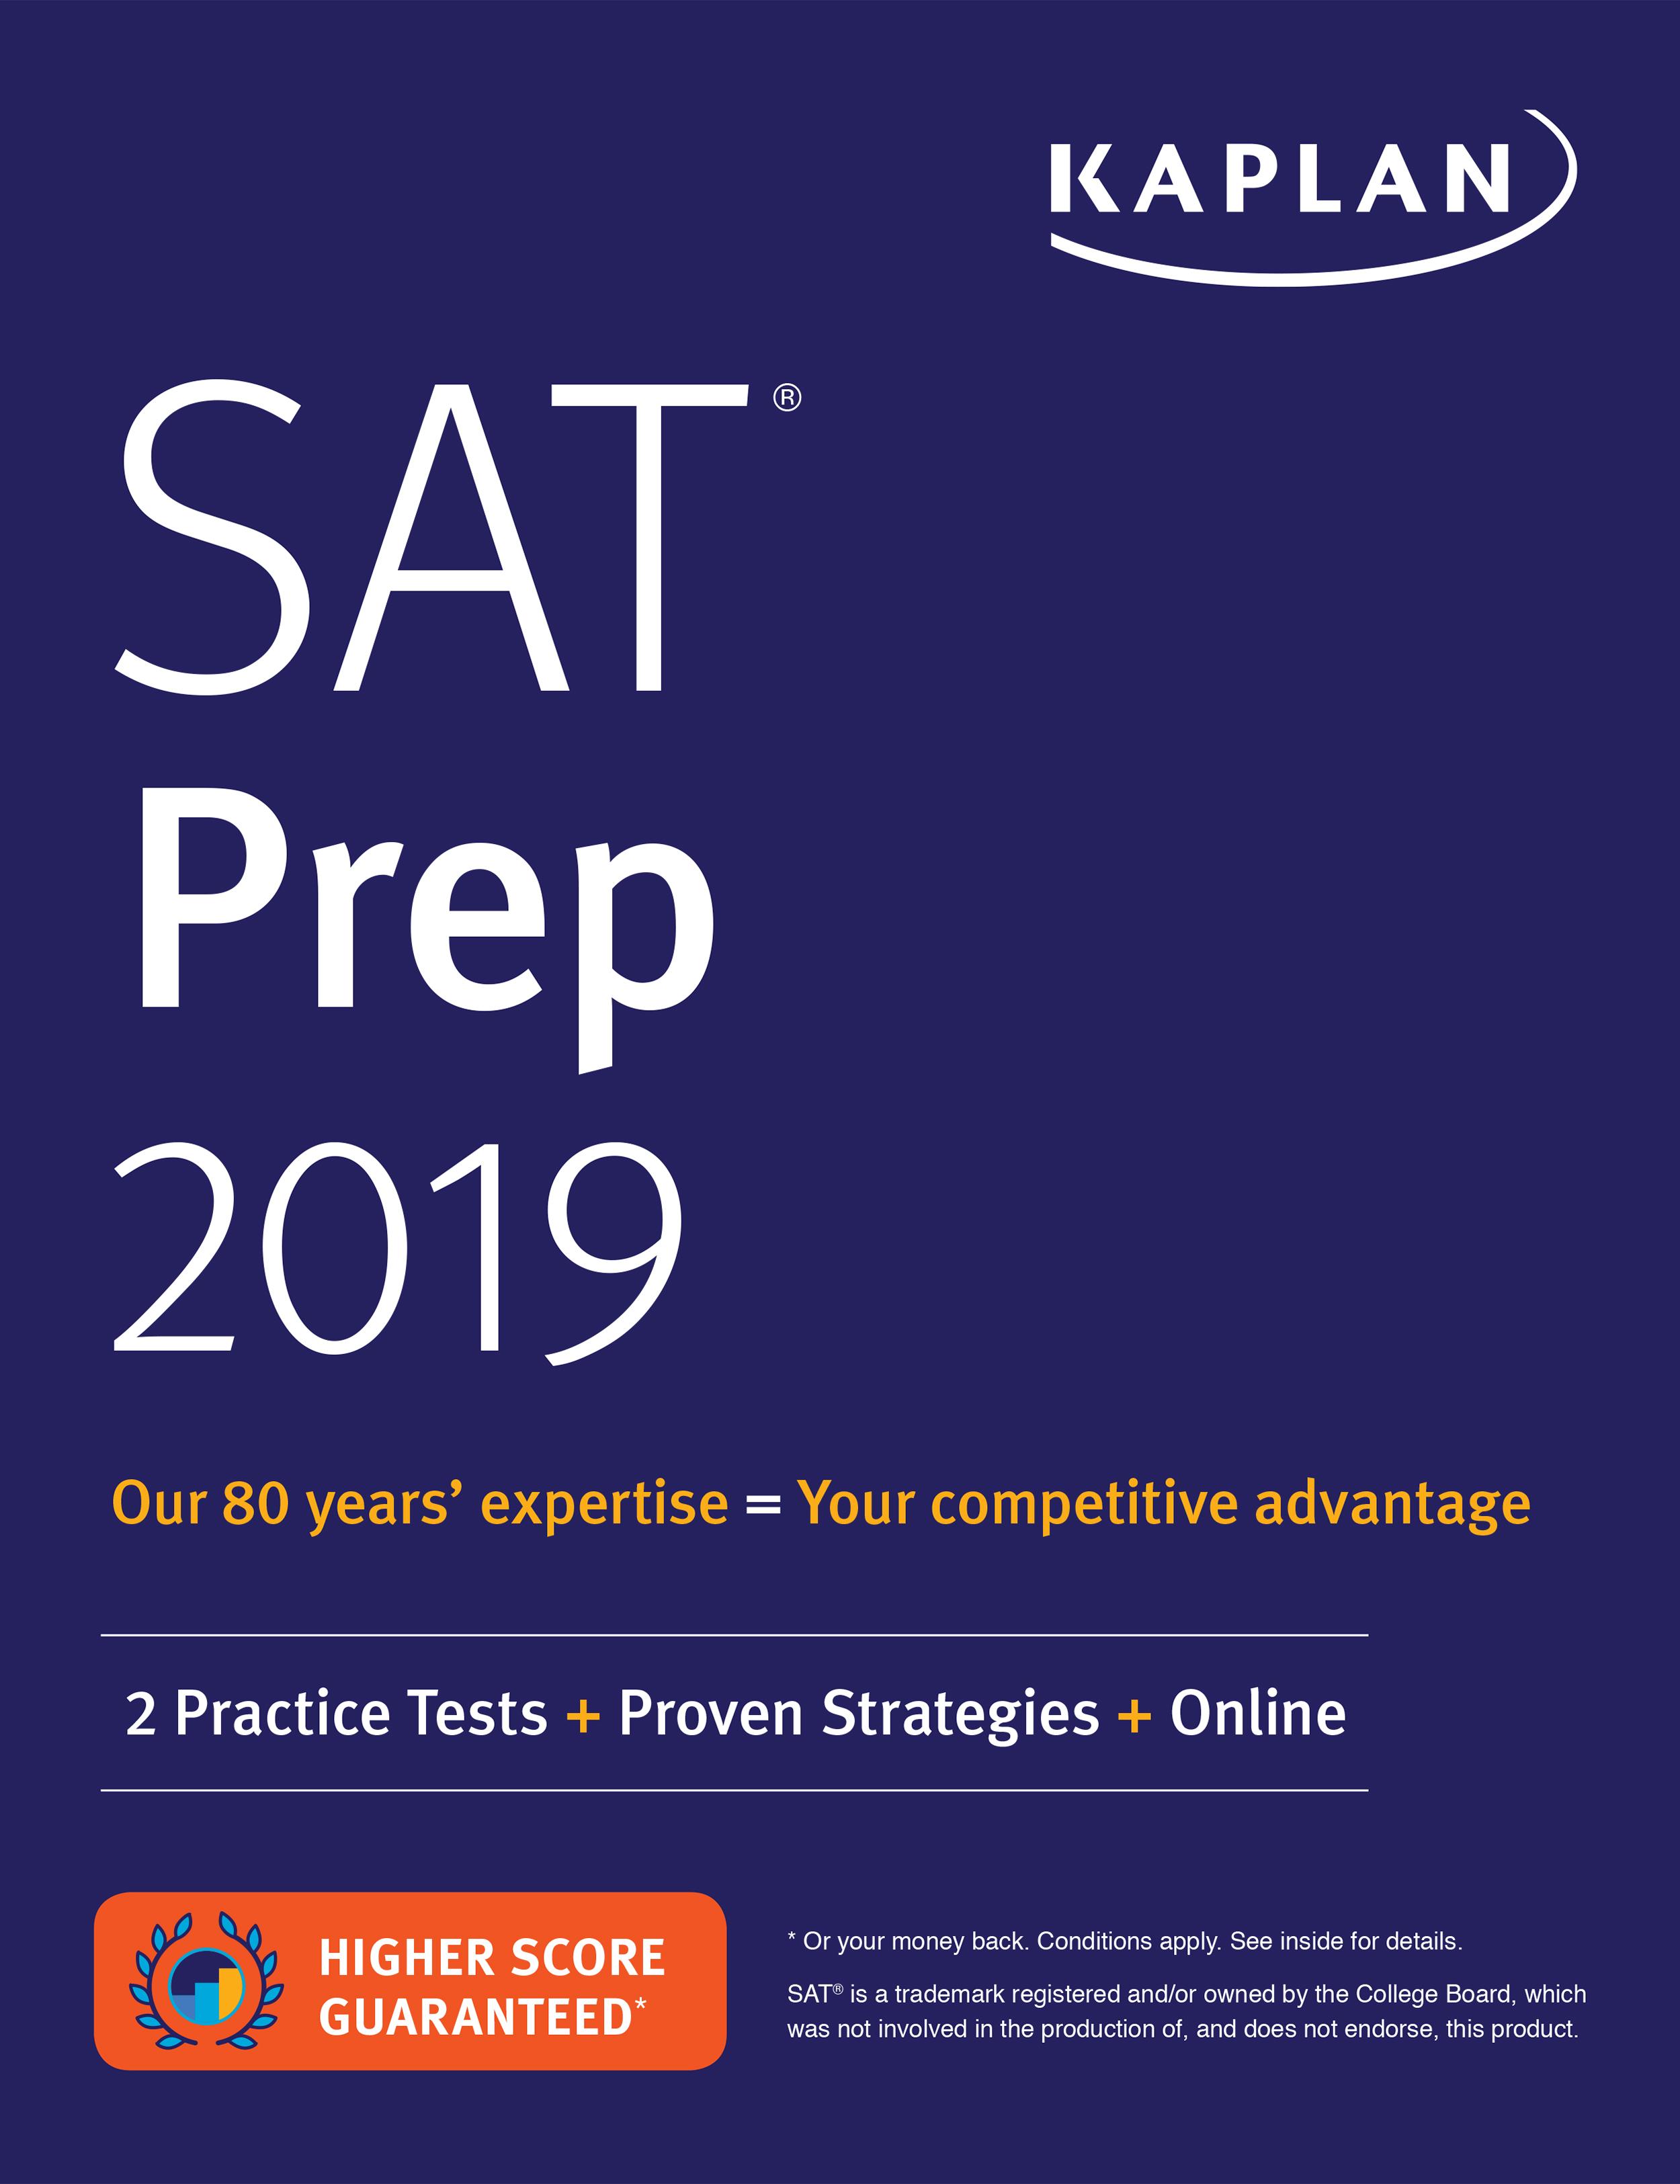 Sat prep book 2018 sat study book bestseller kaplan test prep sat prep 2019 kaplan test prep fandeluxe Images